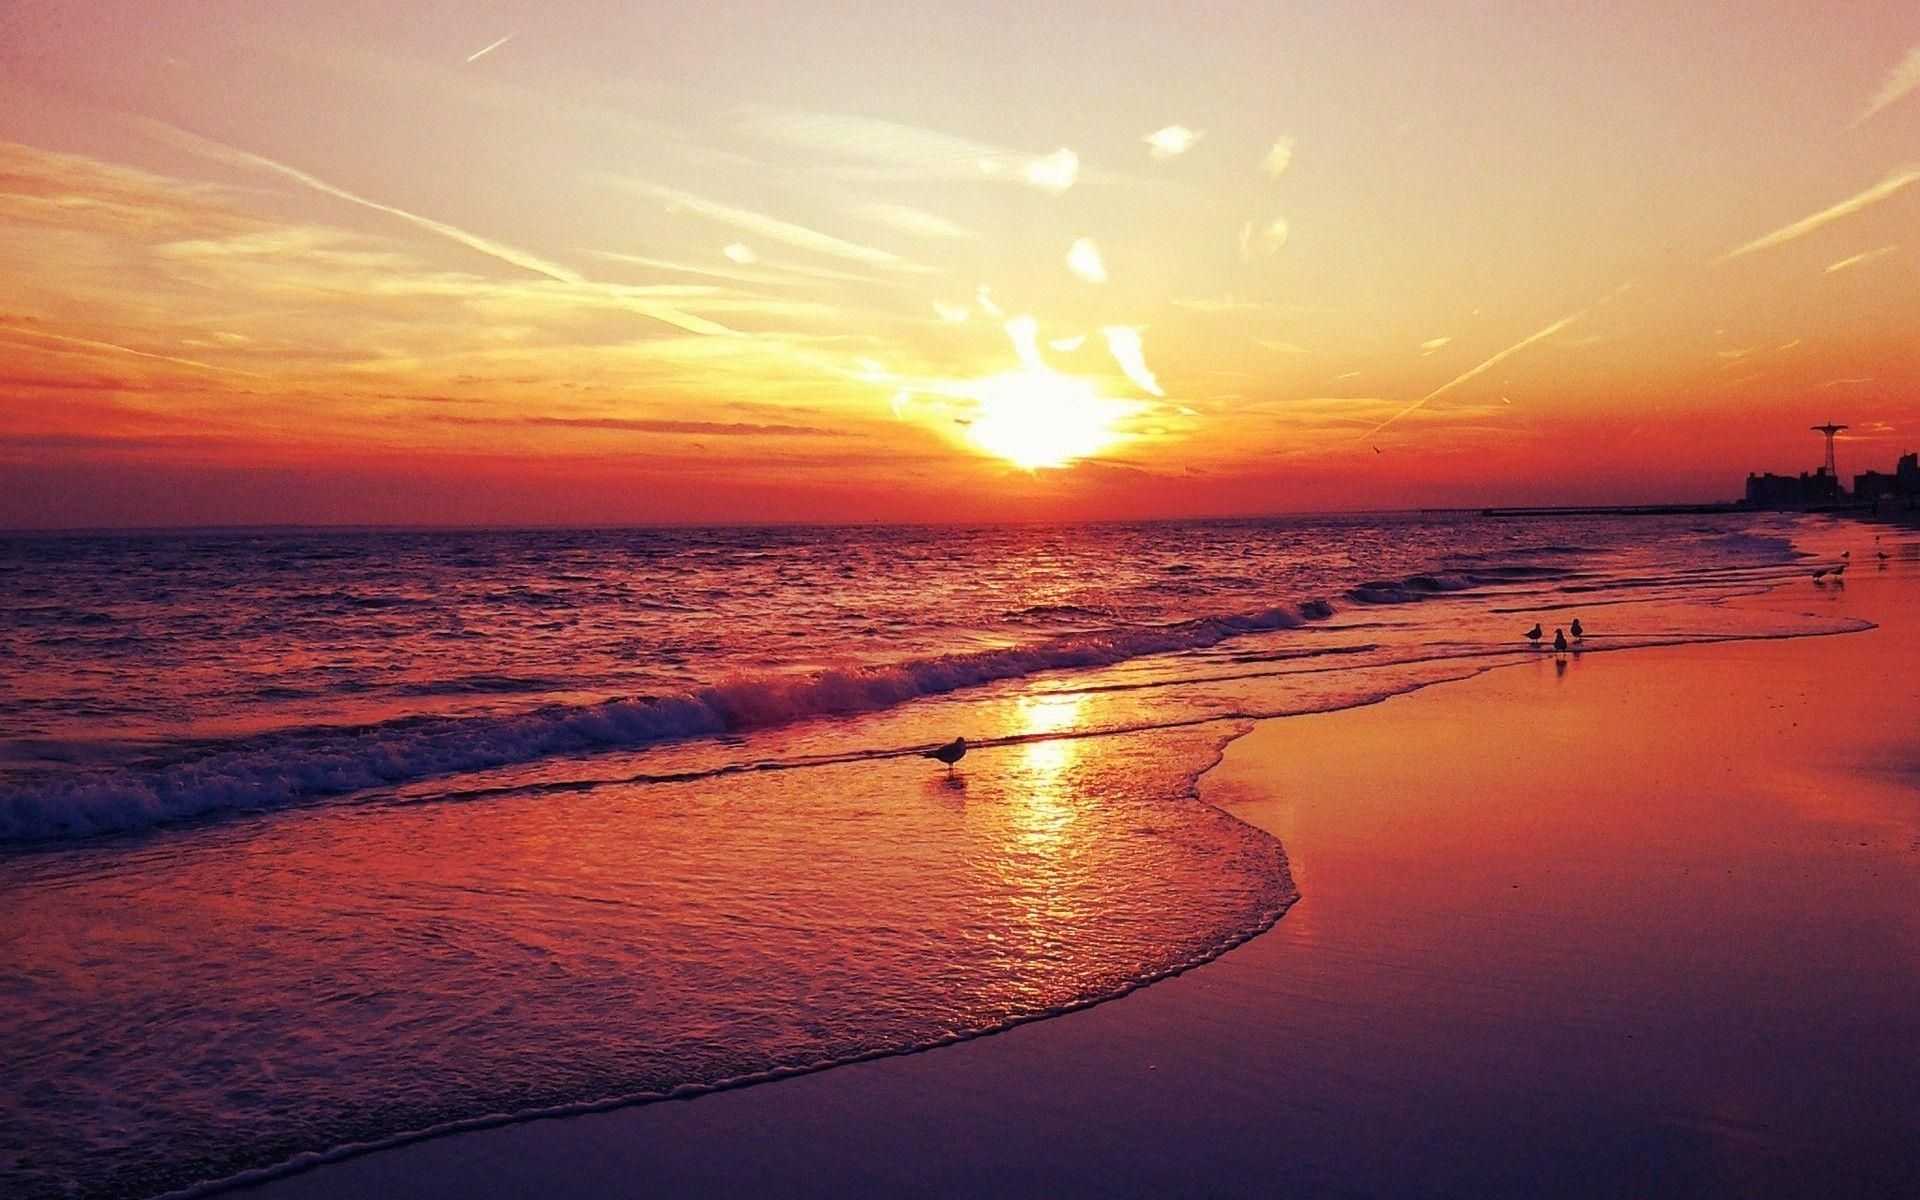 10 Latest Sunset At Beach Wallpaper Full Hd 1080p For Pc Background Beach Sunset Wallpaper Beach Wallpaper Beach Sunset